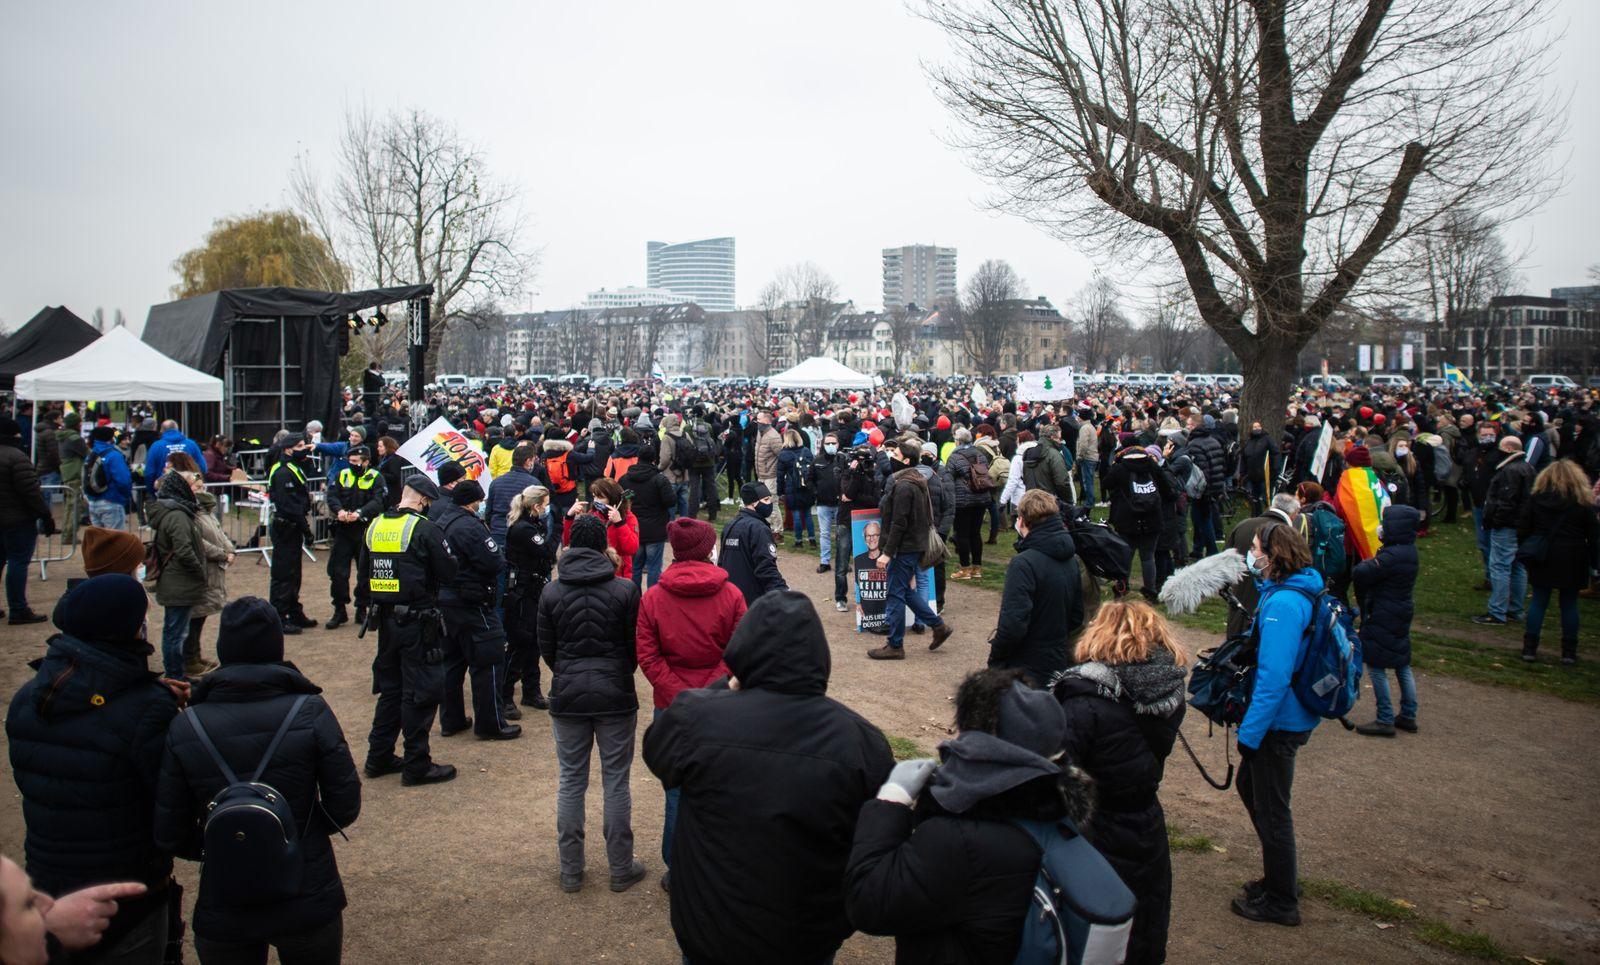 Coronavirus - Demonstration in Düsseldorf